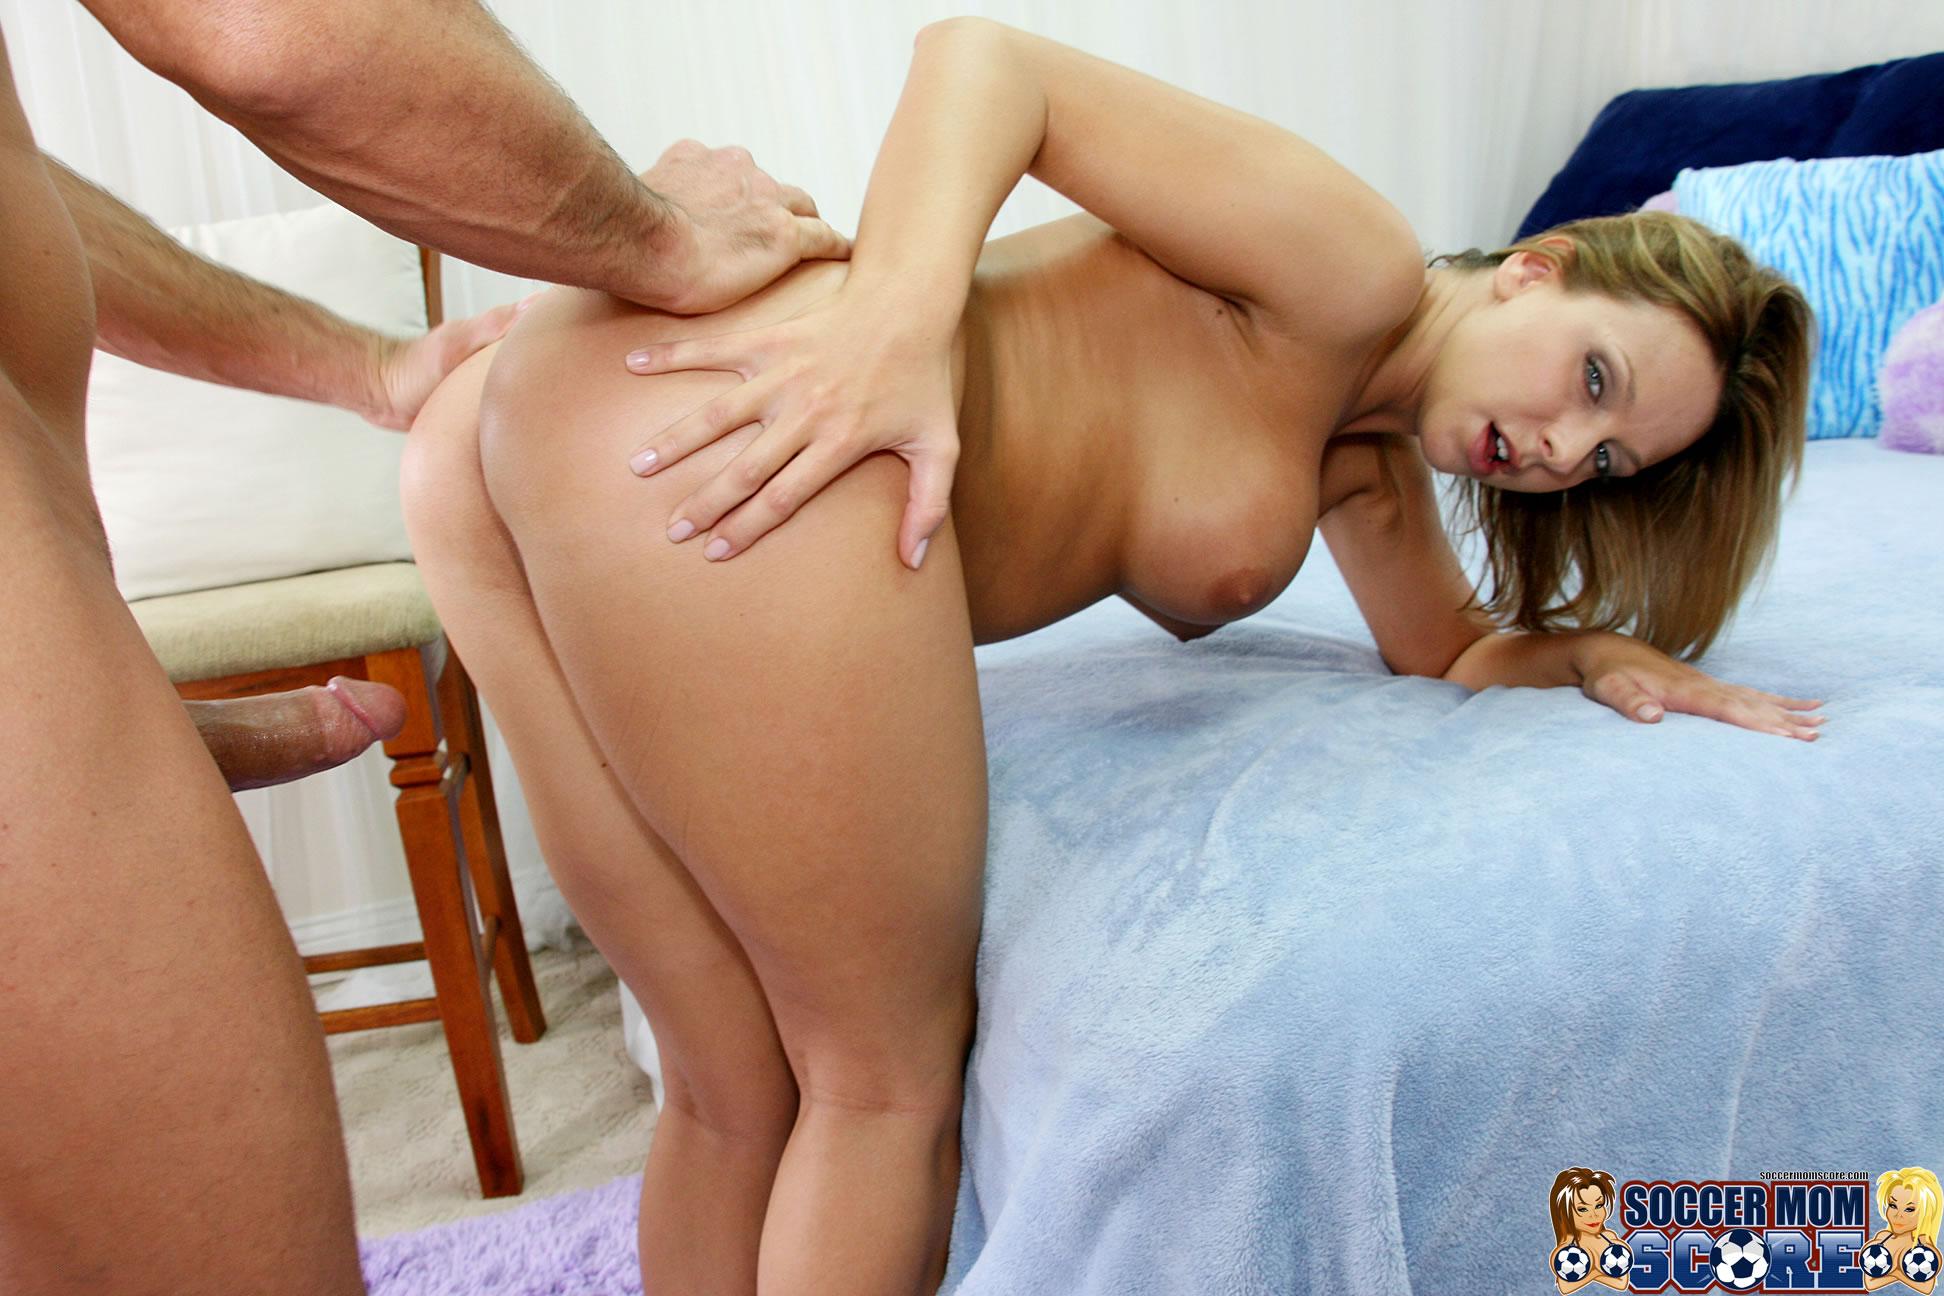 soccer mom porn pics